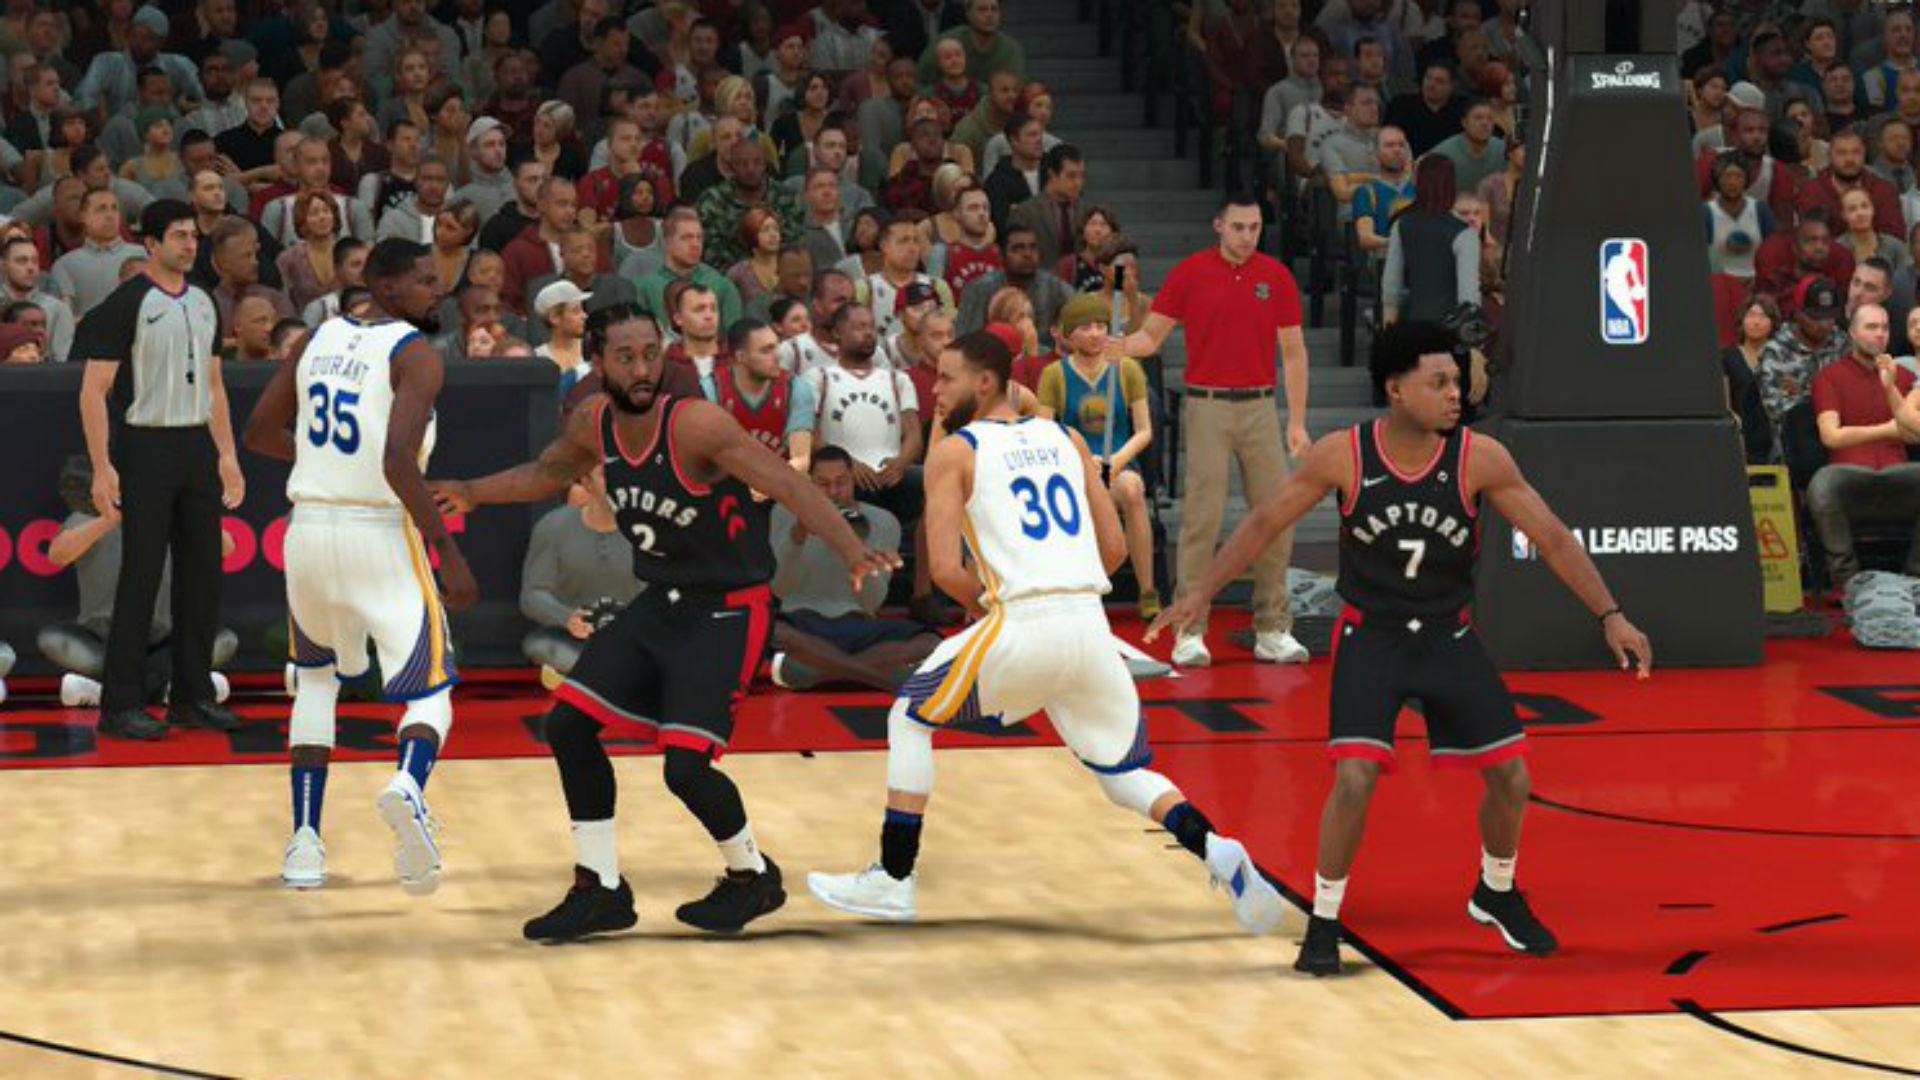 'NBA 2K19' regular season simulations 'heavily favour' Raptors, Warriors | NBA.com